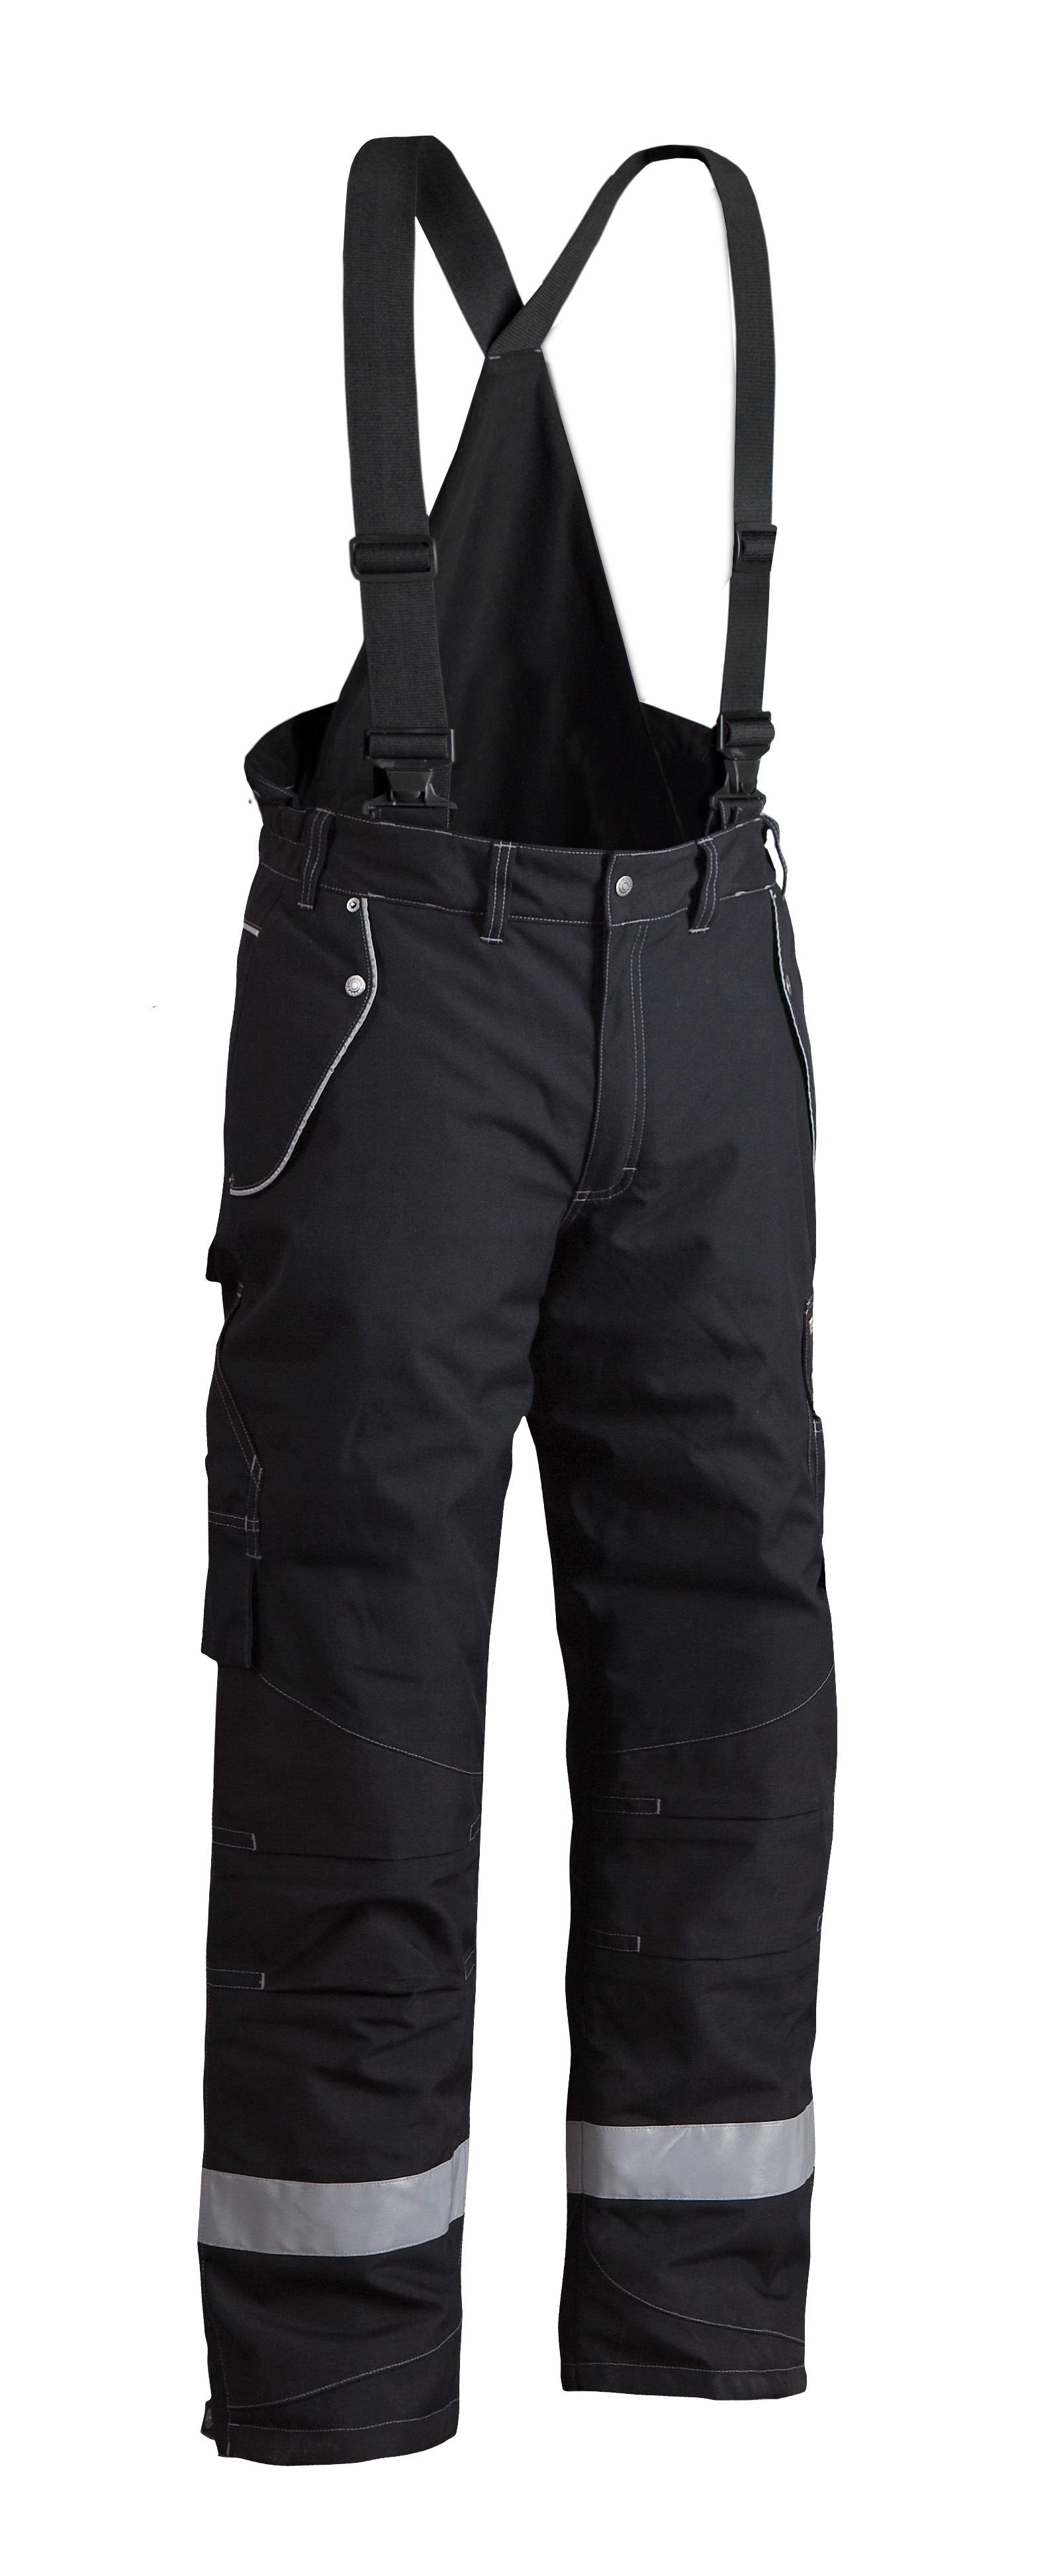 pantalon hiver pantalons de travail v tements de travail hiver v tements de travail. Black Bedroom Furniture Sets. Home Design Ideas